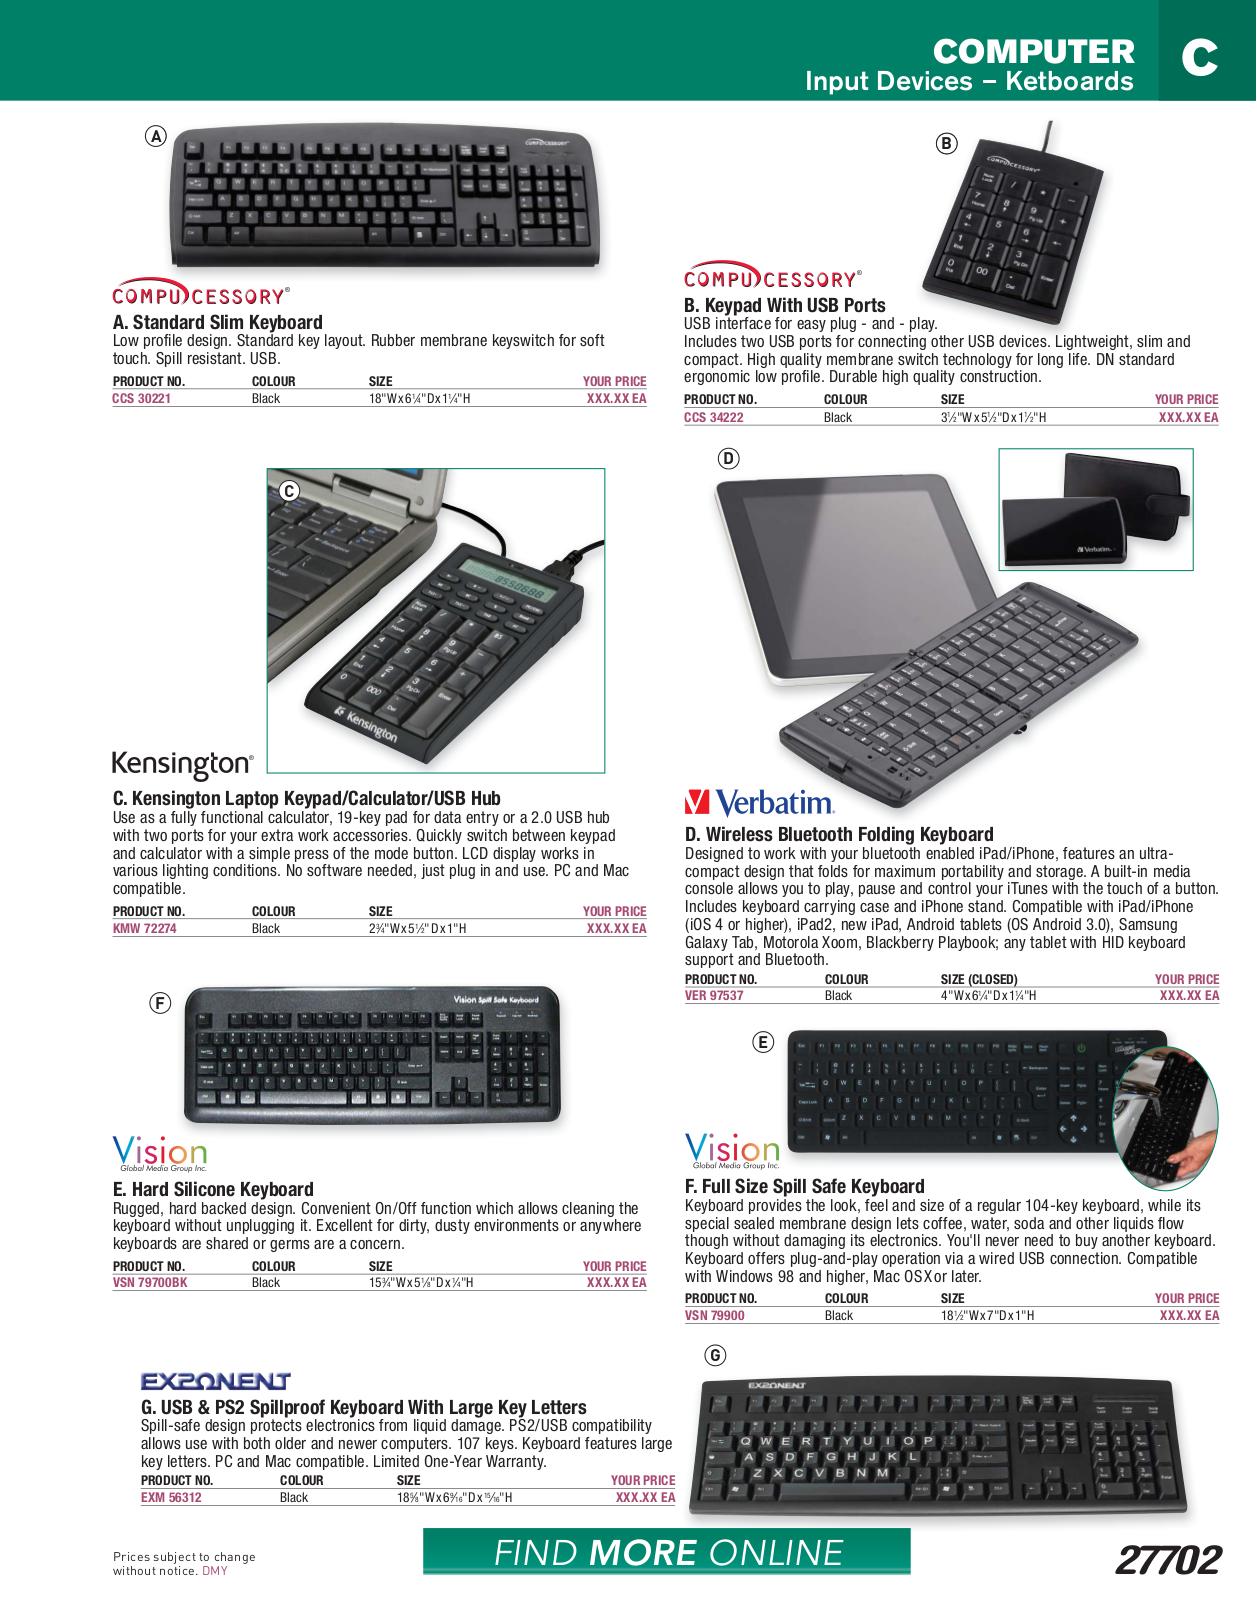 pdf for Kensington Keyboard 72274 manual